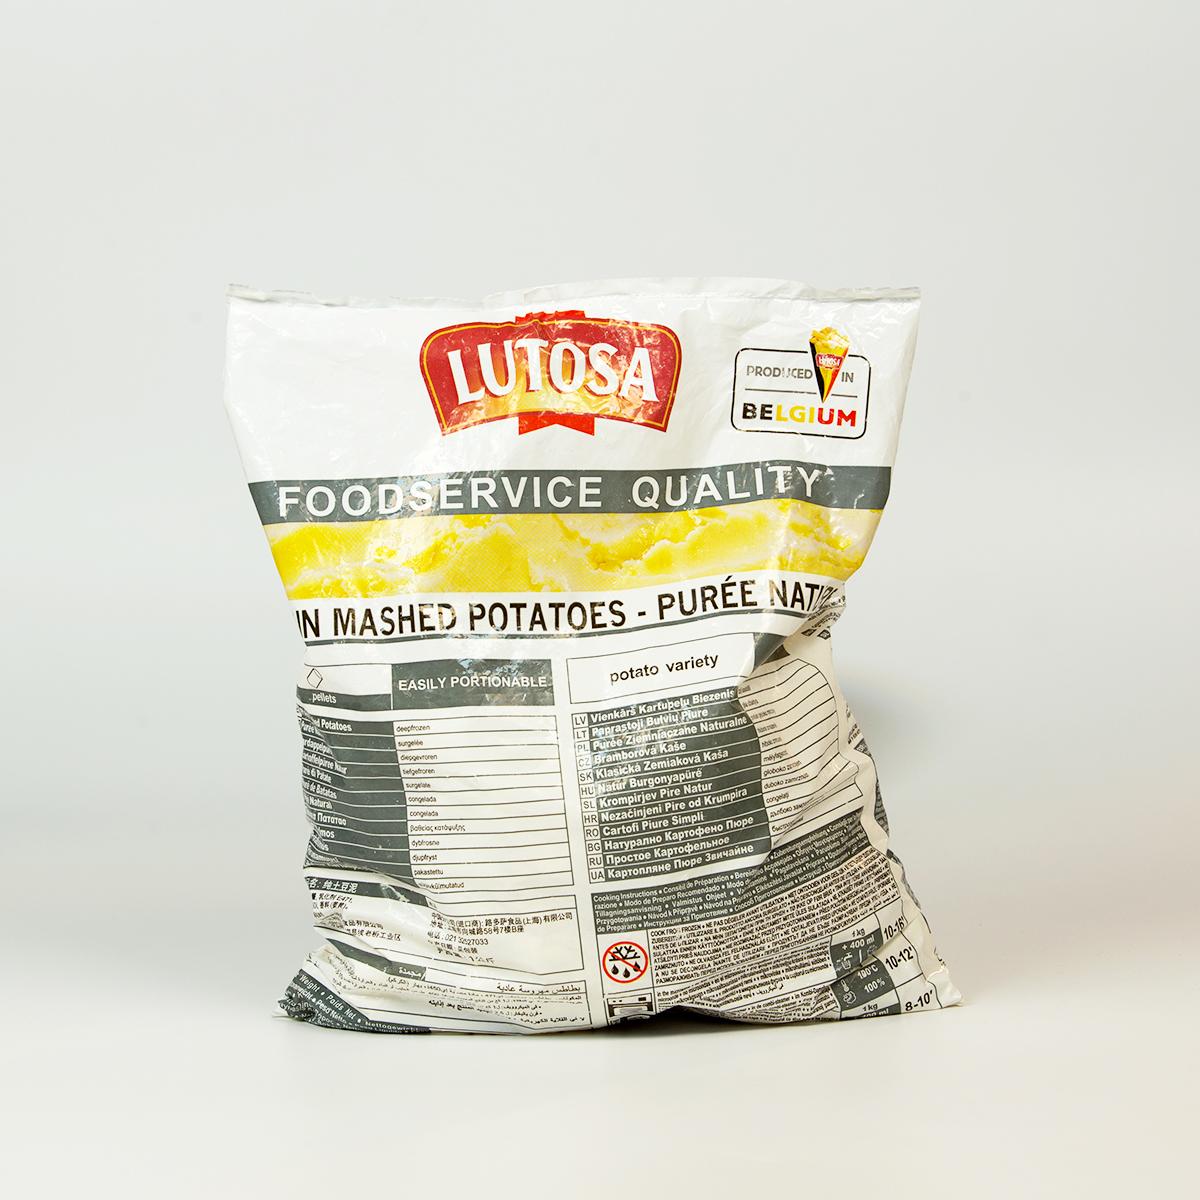 Plain Mashed Potatoes Foodservice - Khoai tây nghiền Foodservice - Sản phẩm hữu cơ, nhập khẩu